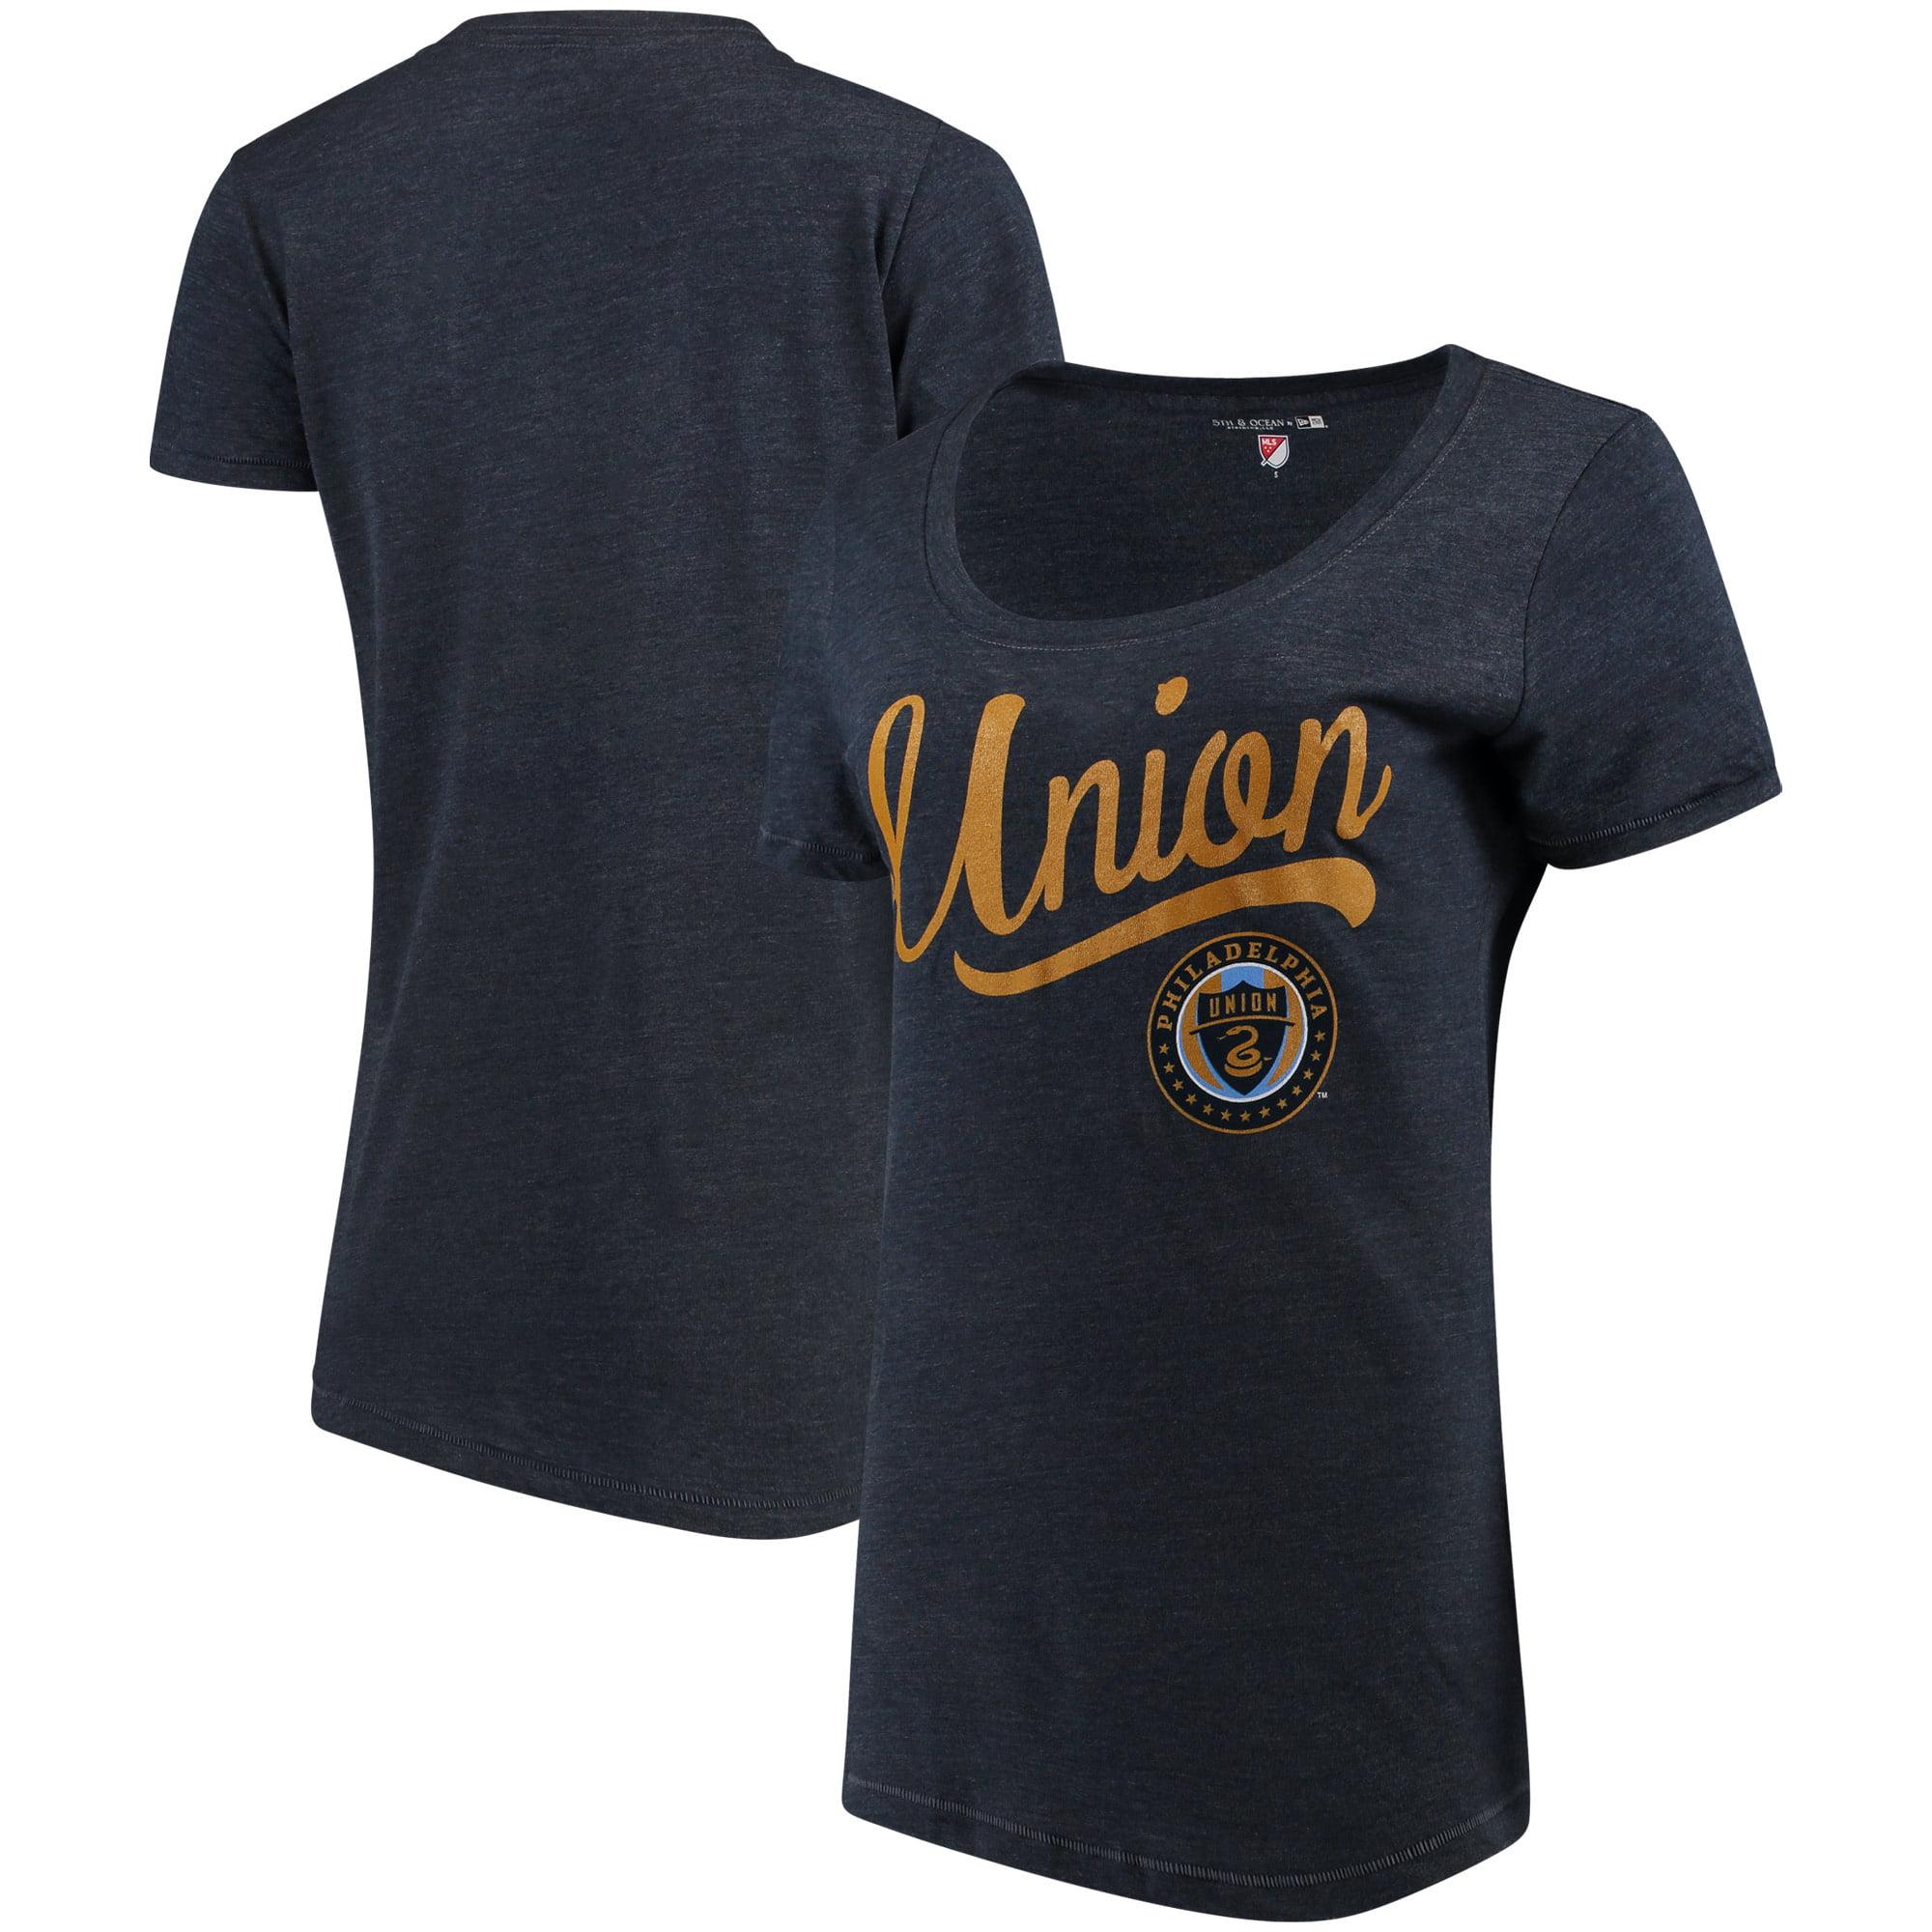 Philadelphia Union 5th & Ocean by New Era Women's Scoop Neck Tri-Blend T-Shirt - Navy